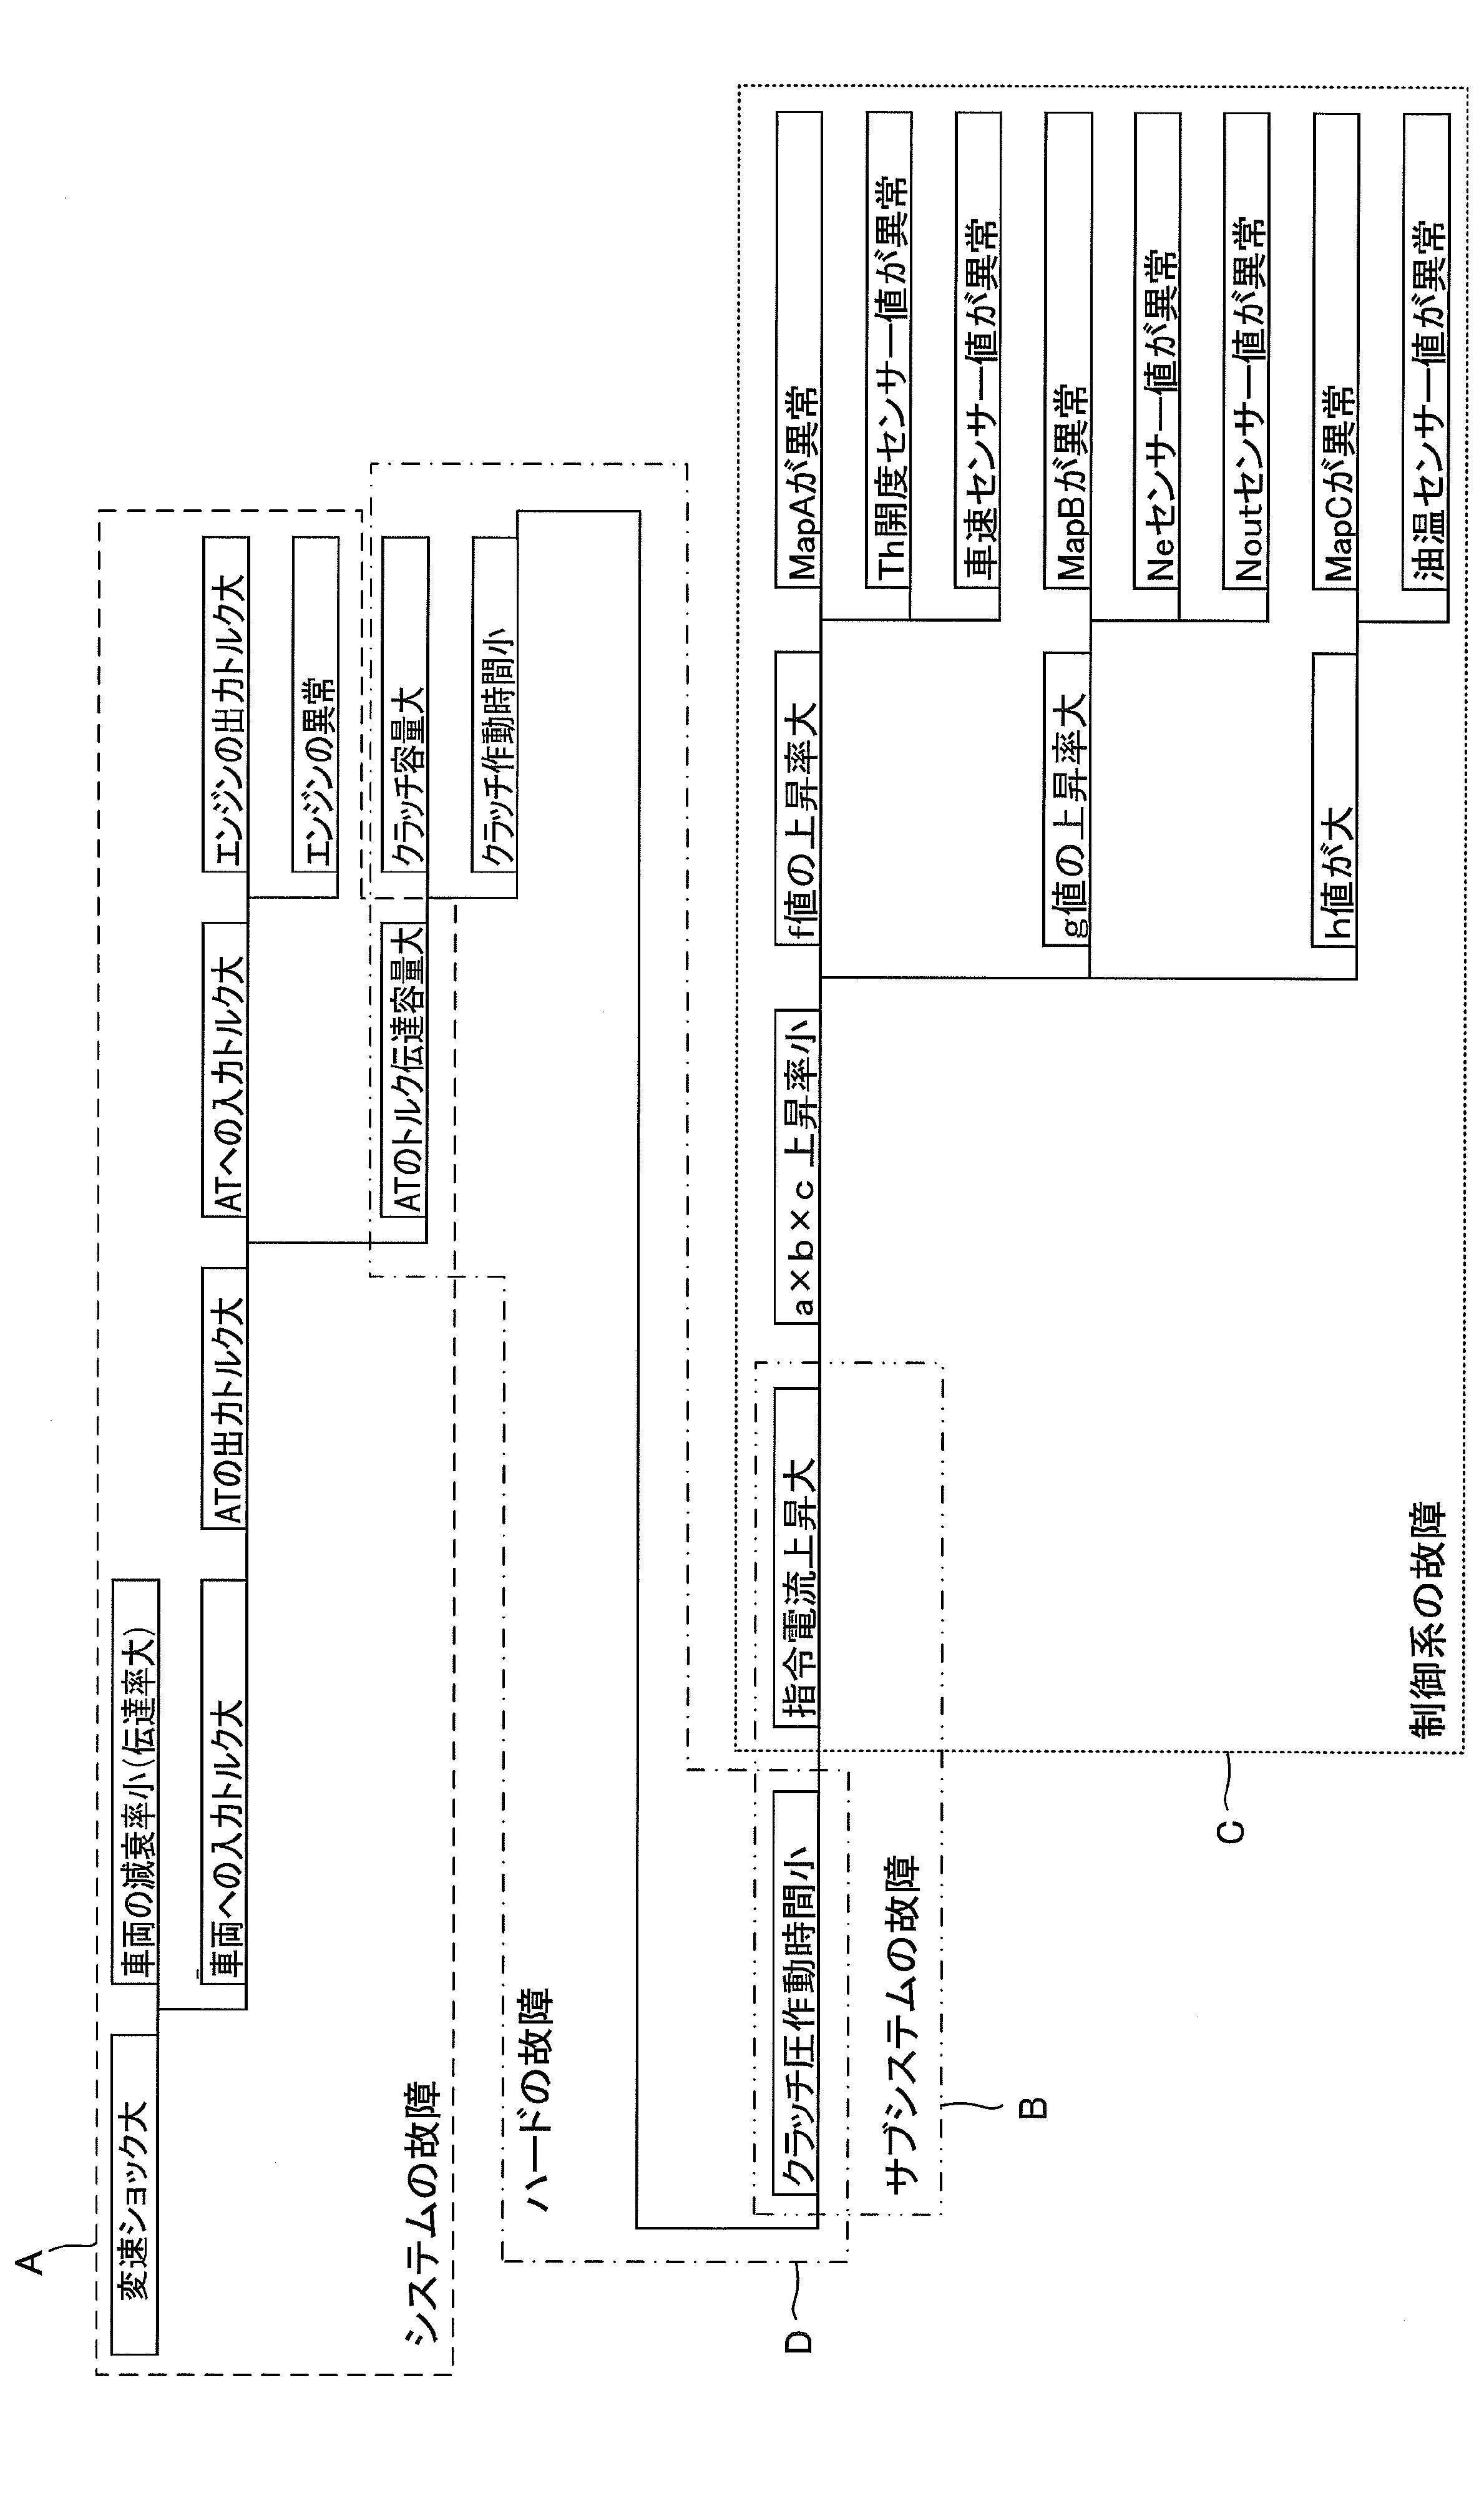 WO2013058028A1 - Ft図作成支援装置及びft図作成支援方法         - Google PatentsFamily